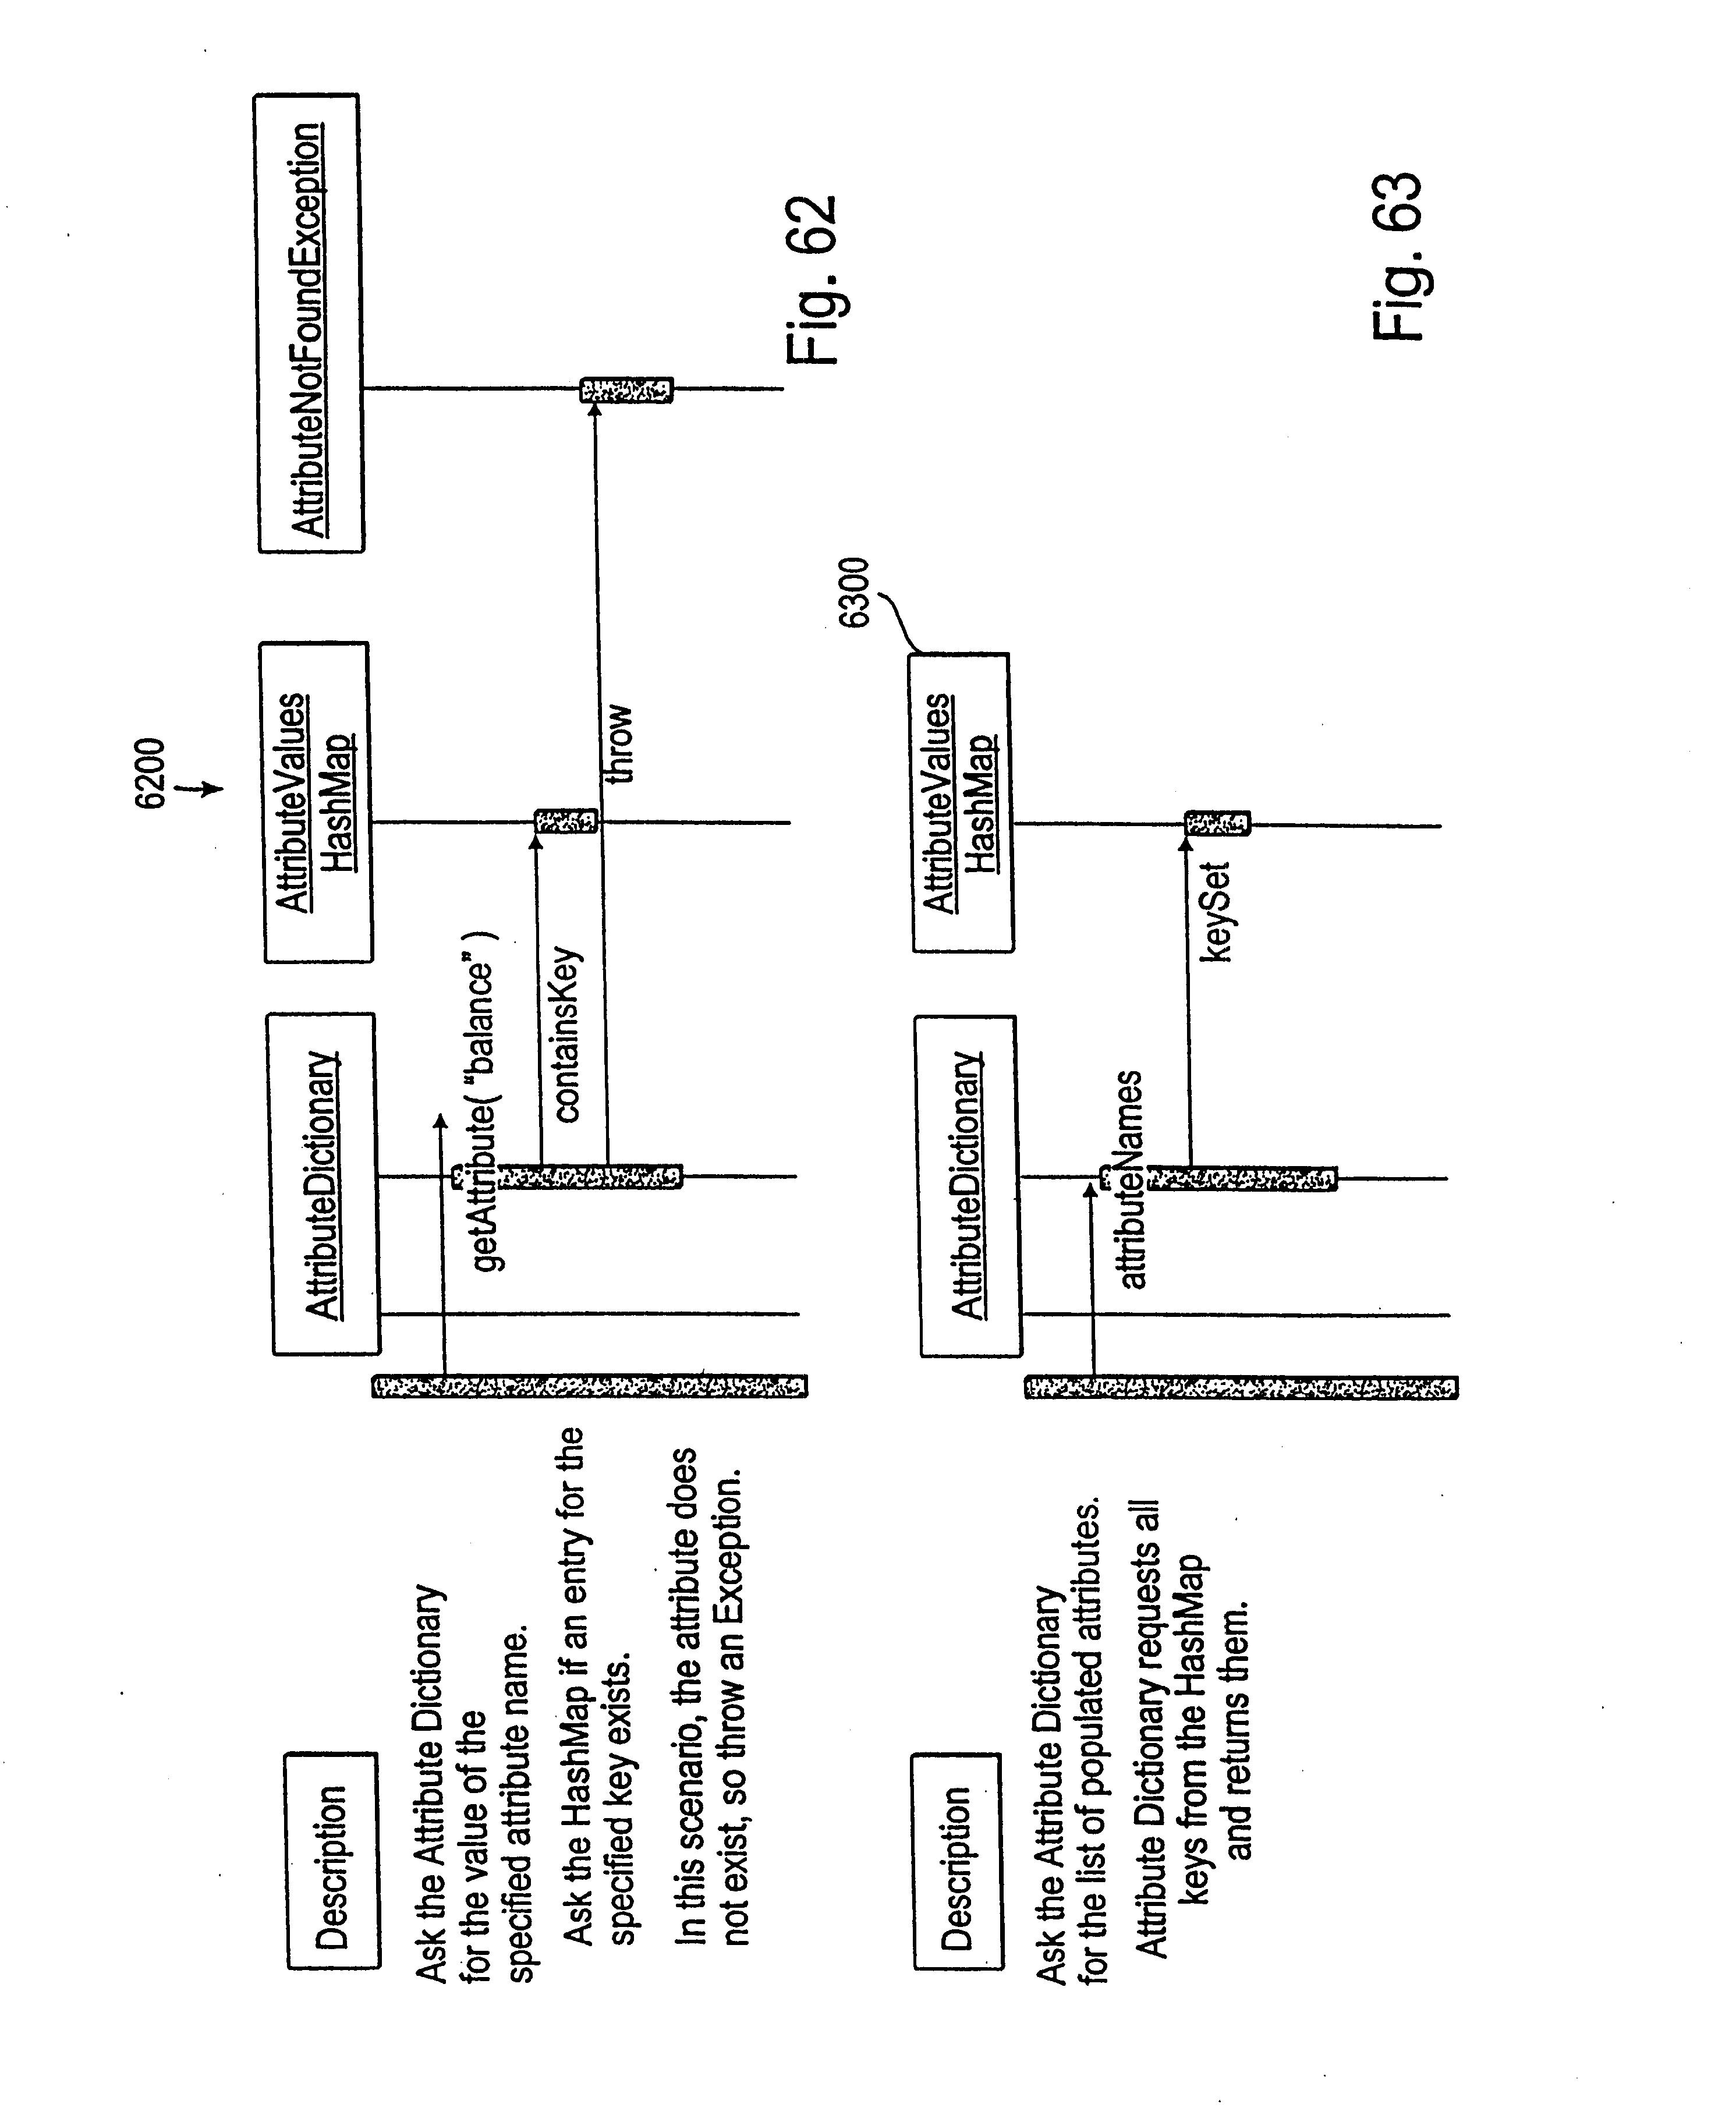 5404 viper car alarm system wiring diagram